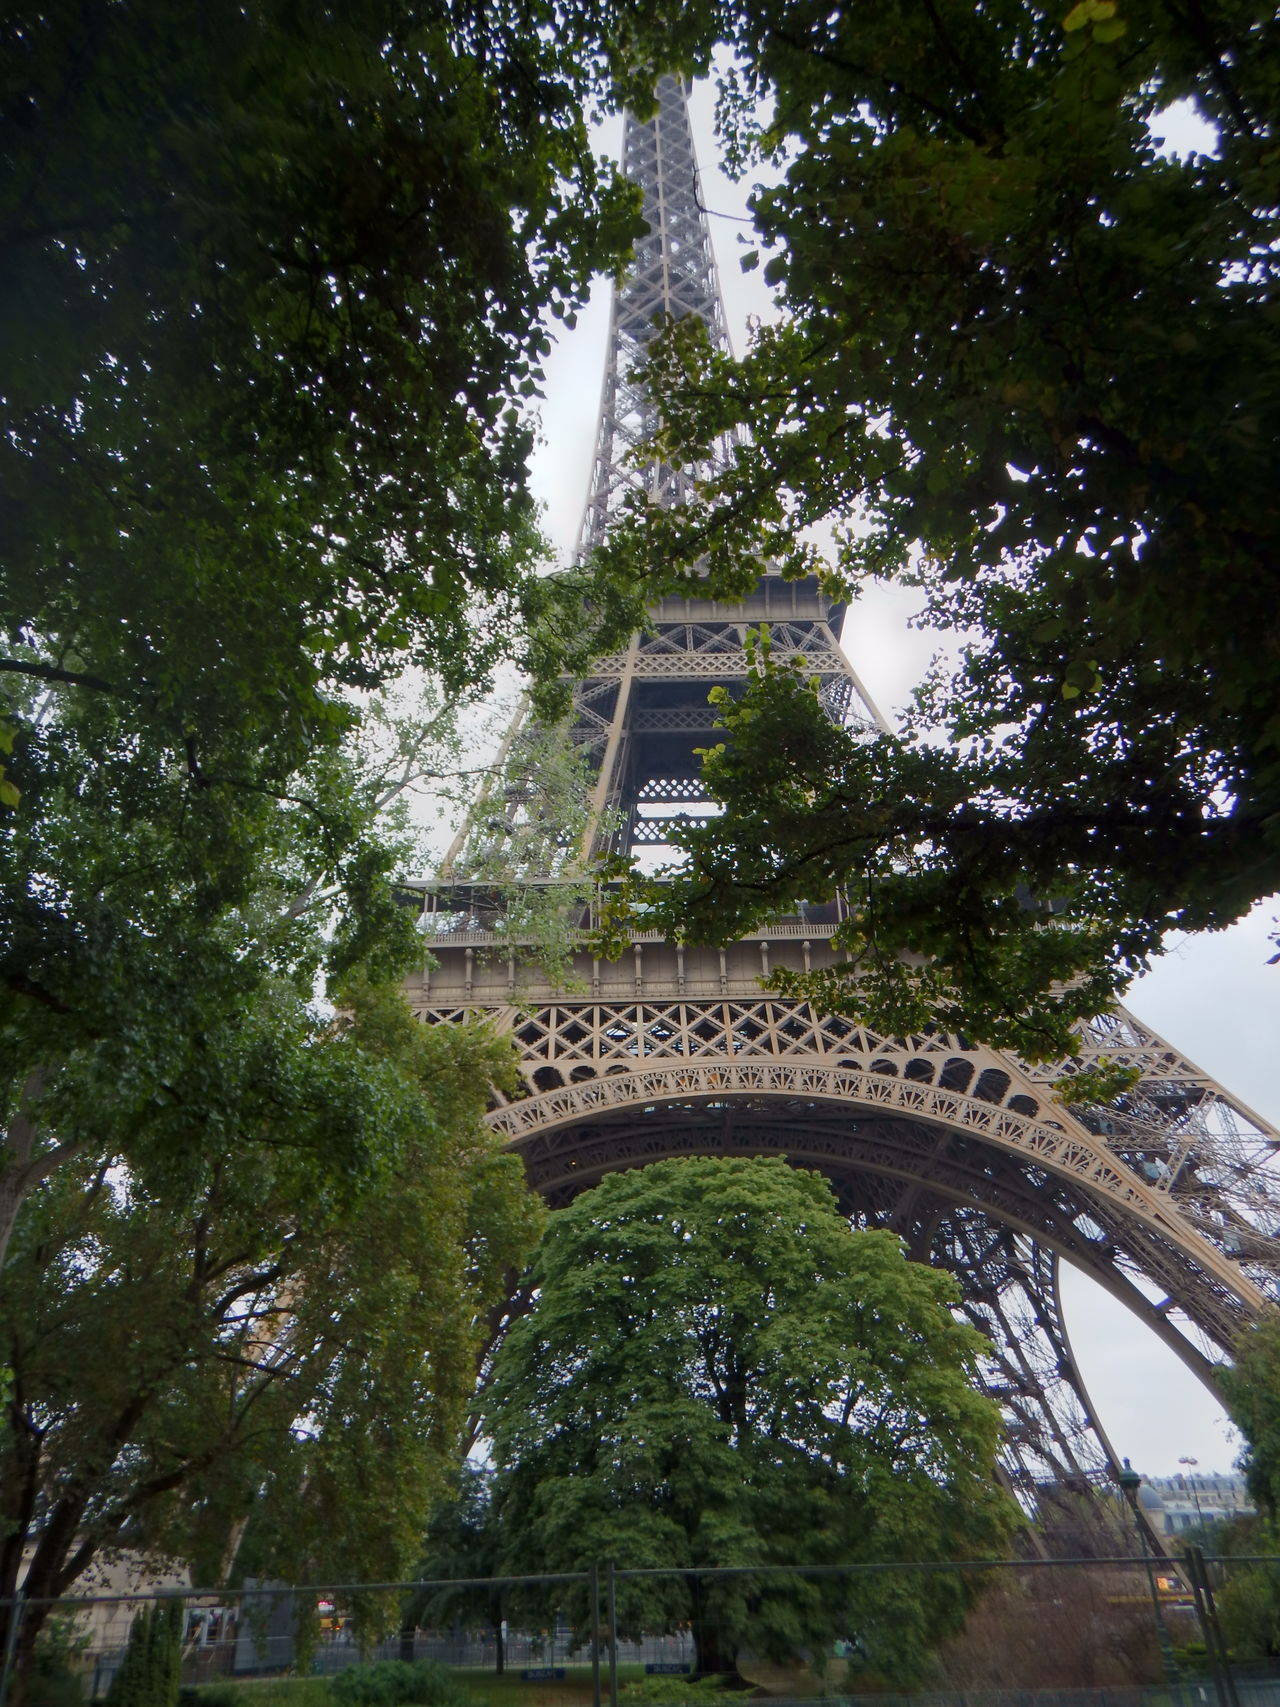 Paris Bikeride Bikeride Throigh The City Tour Eiffel Toureiffelparis Autumninparis Weekend In Paris Parisbybike TheEndOfSummer Autumniscoming